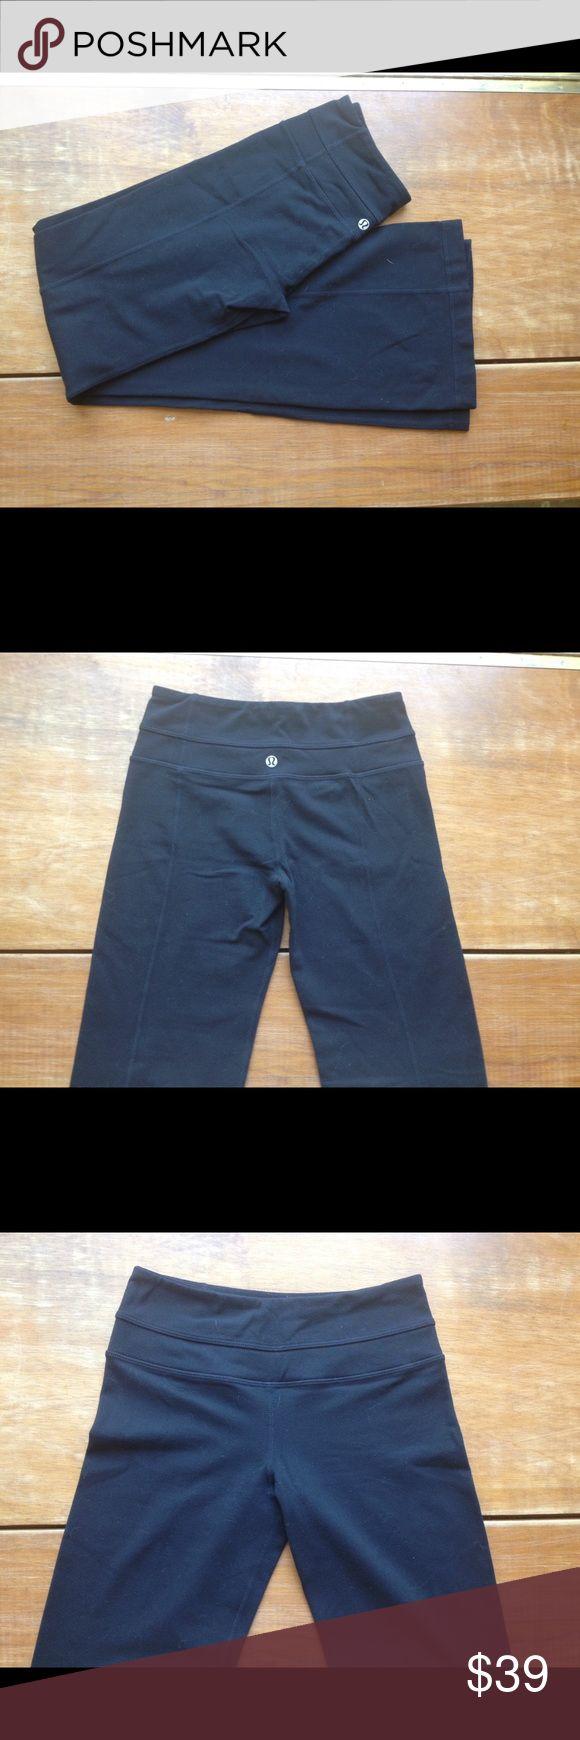 SALE🎈Lululemon black yoga pants🍃 Classic black bootcut lululemons yoga pants 🌿 secret pocket located in rear.                              Choice of any sports bra with purchase. lululemon athletica Pants Boot Cut & Flare